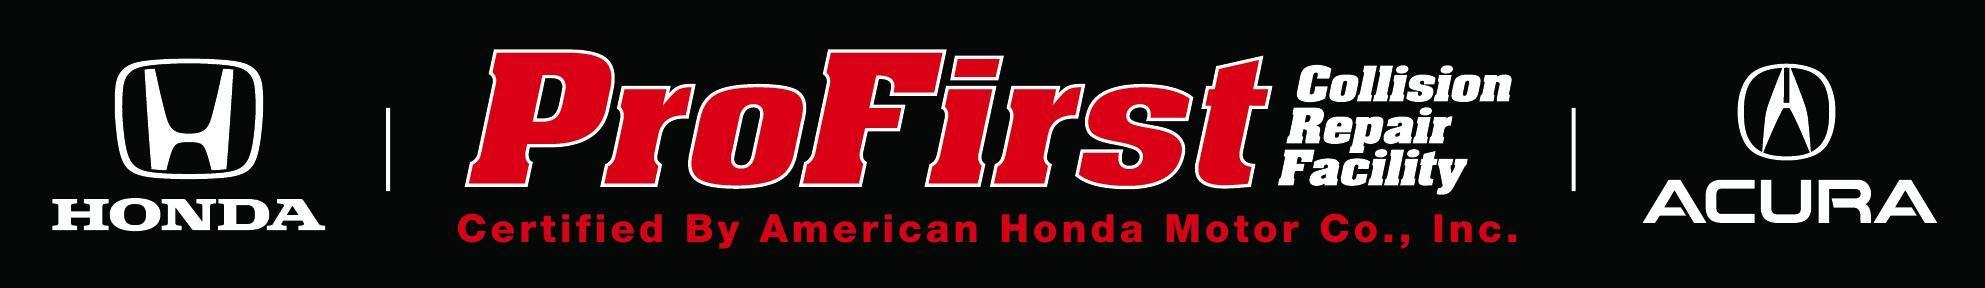 Mossy Honda Collision Center